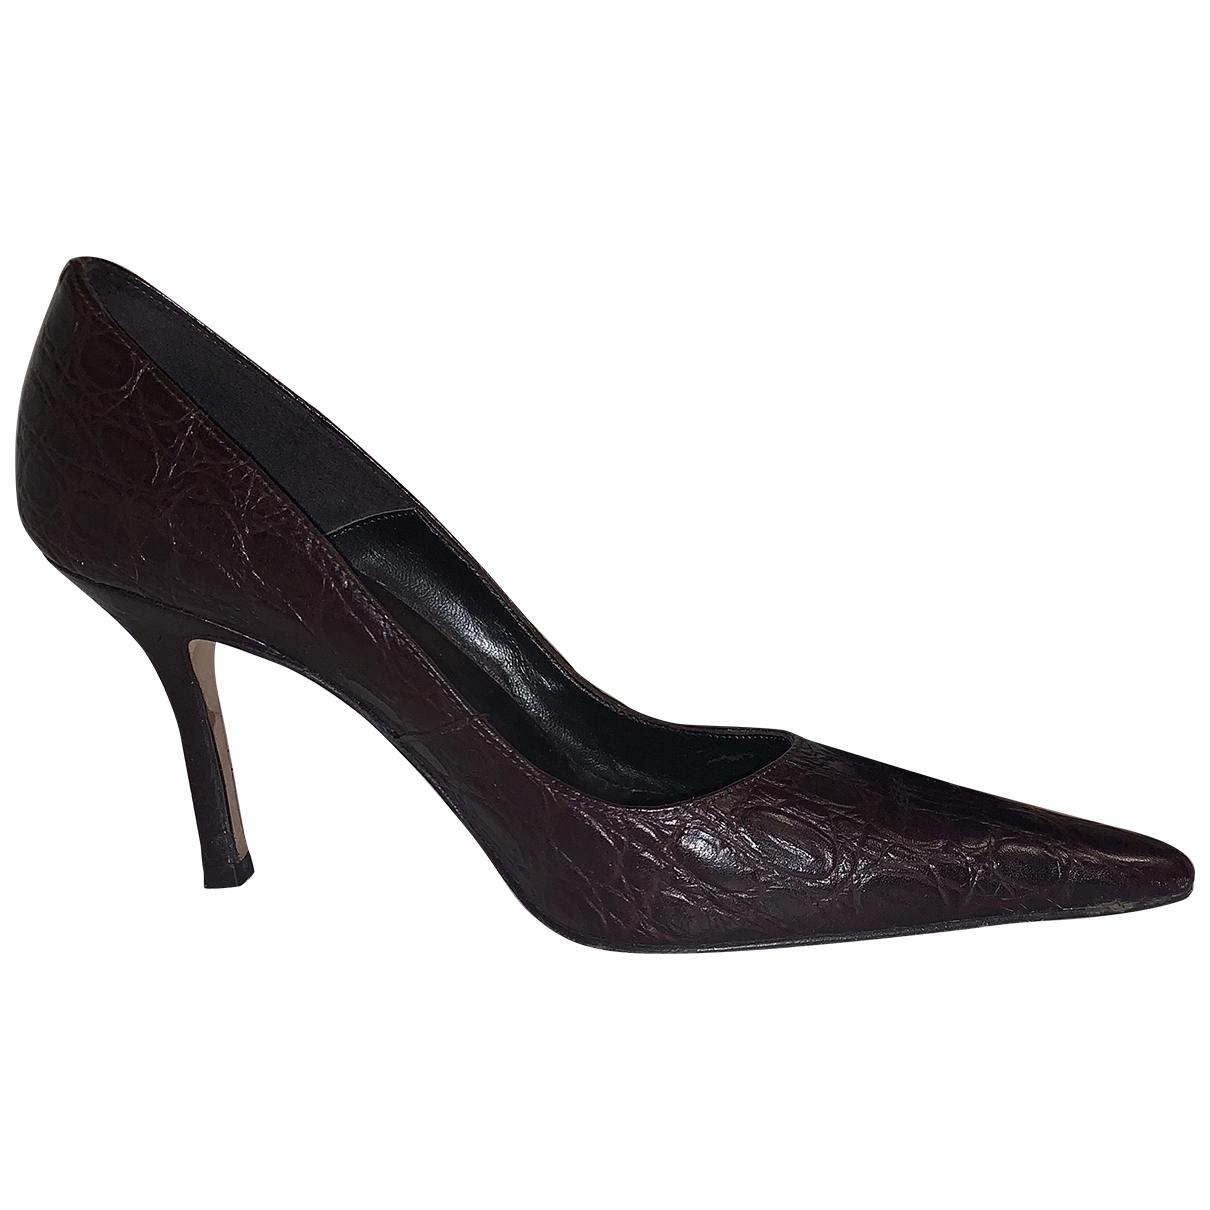 Lk Bennett \N Brown Leather Heels for Women 39 EU